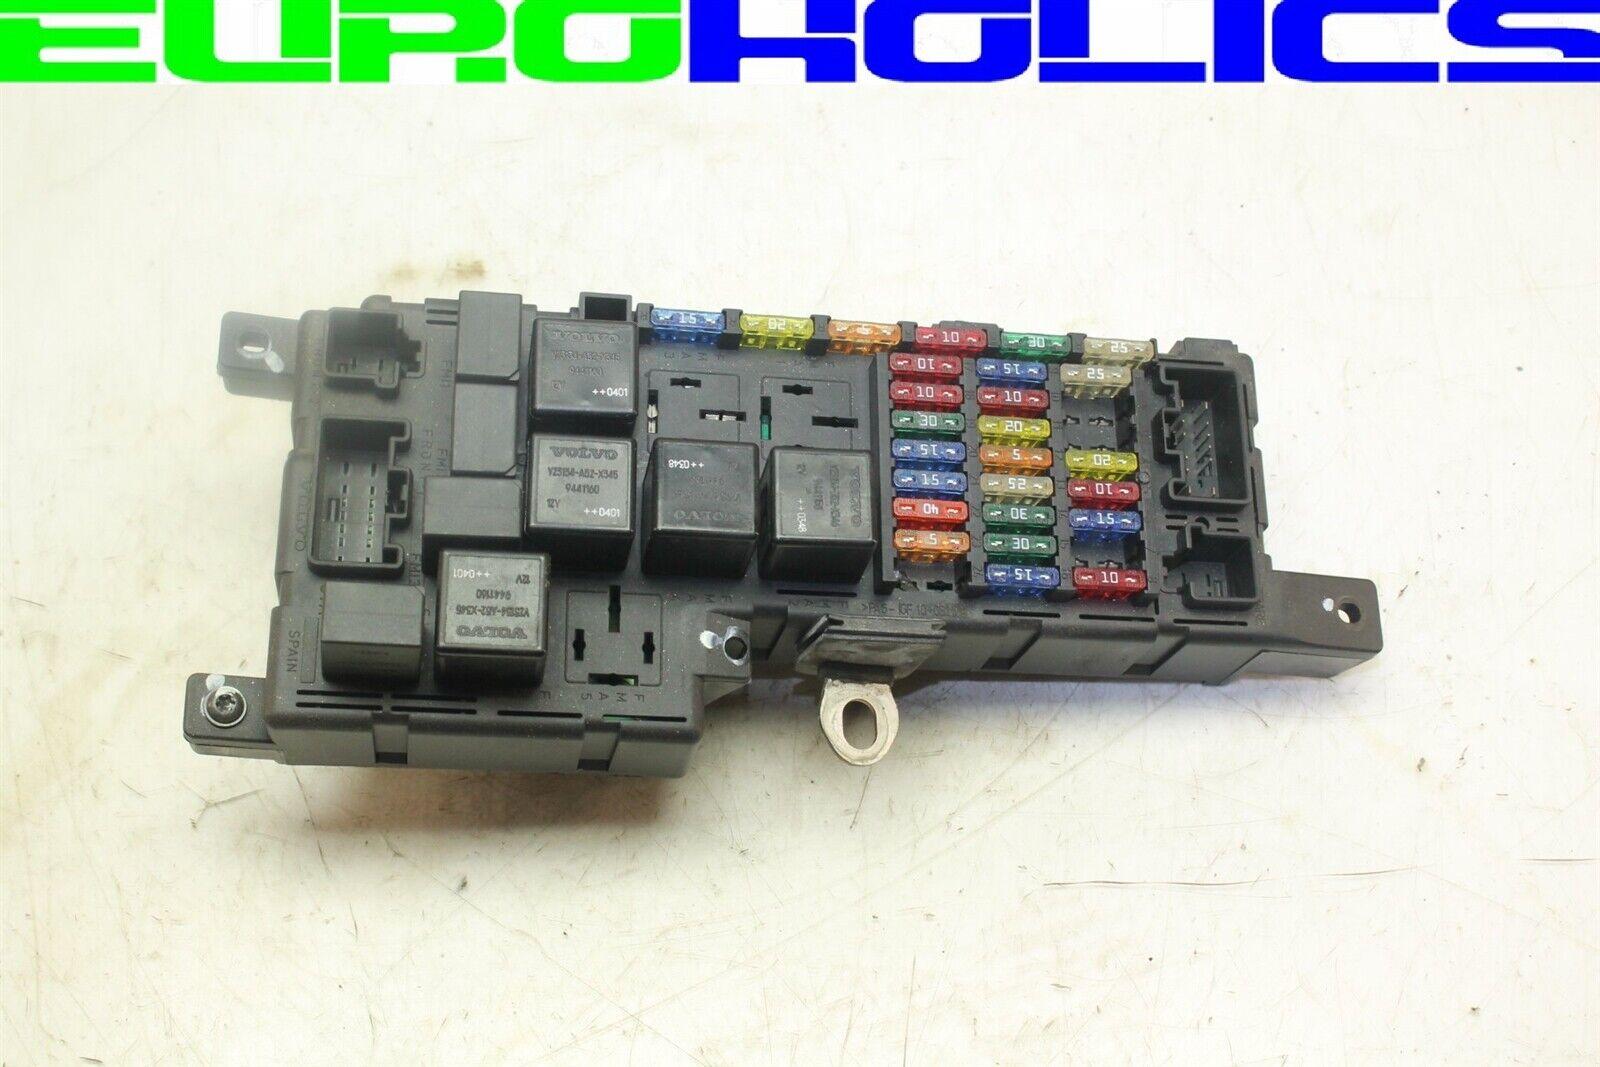 05-14 Volvo Xc90 Engine Fuse Box Relay Block Panel 28017881 OEM for sale  online   eBay   Volvo Xc90 Engine Fuse Diagram      eBay